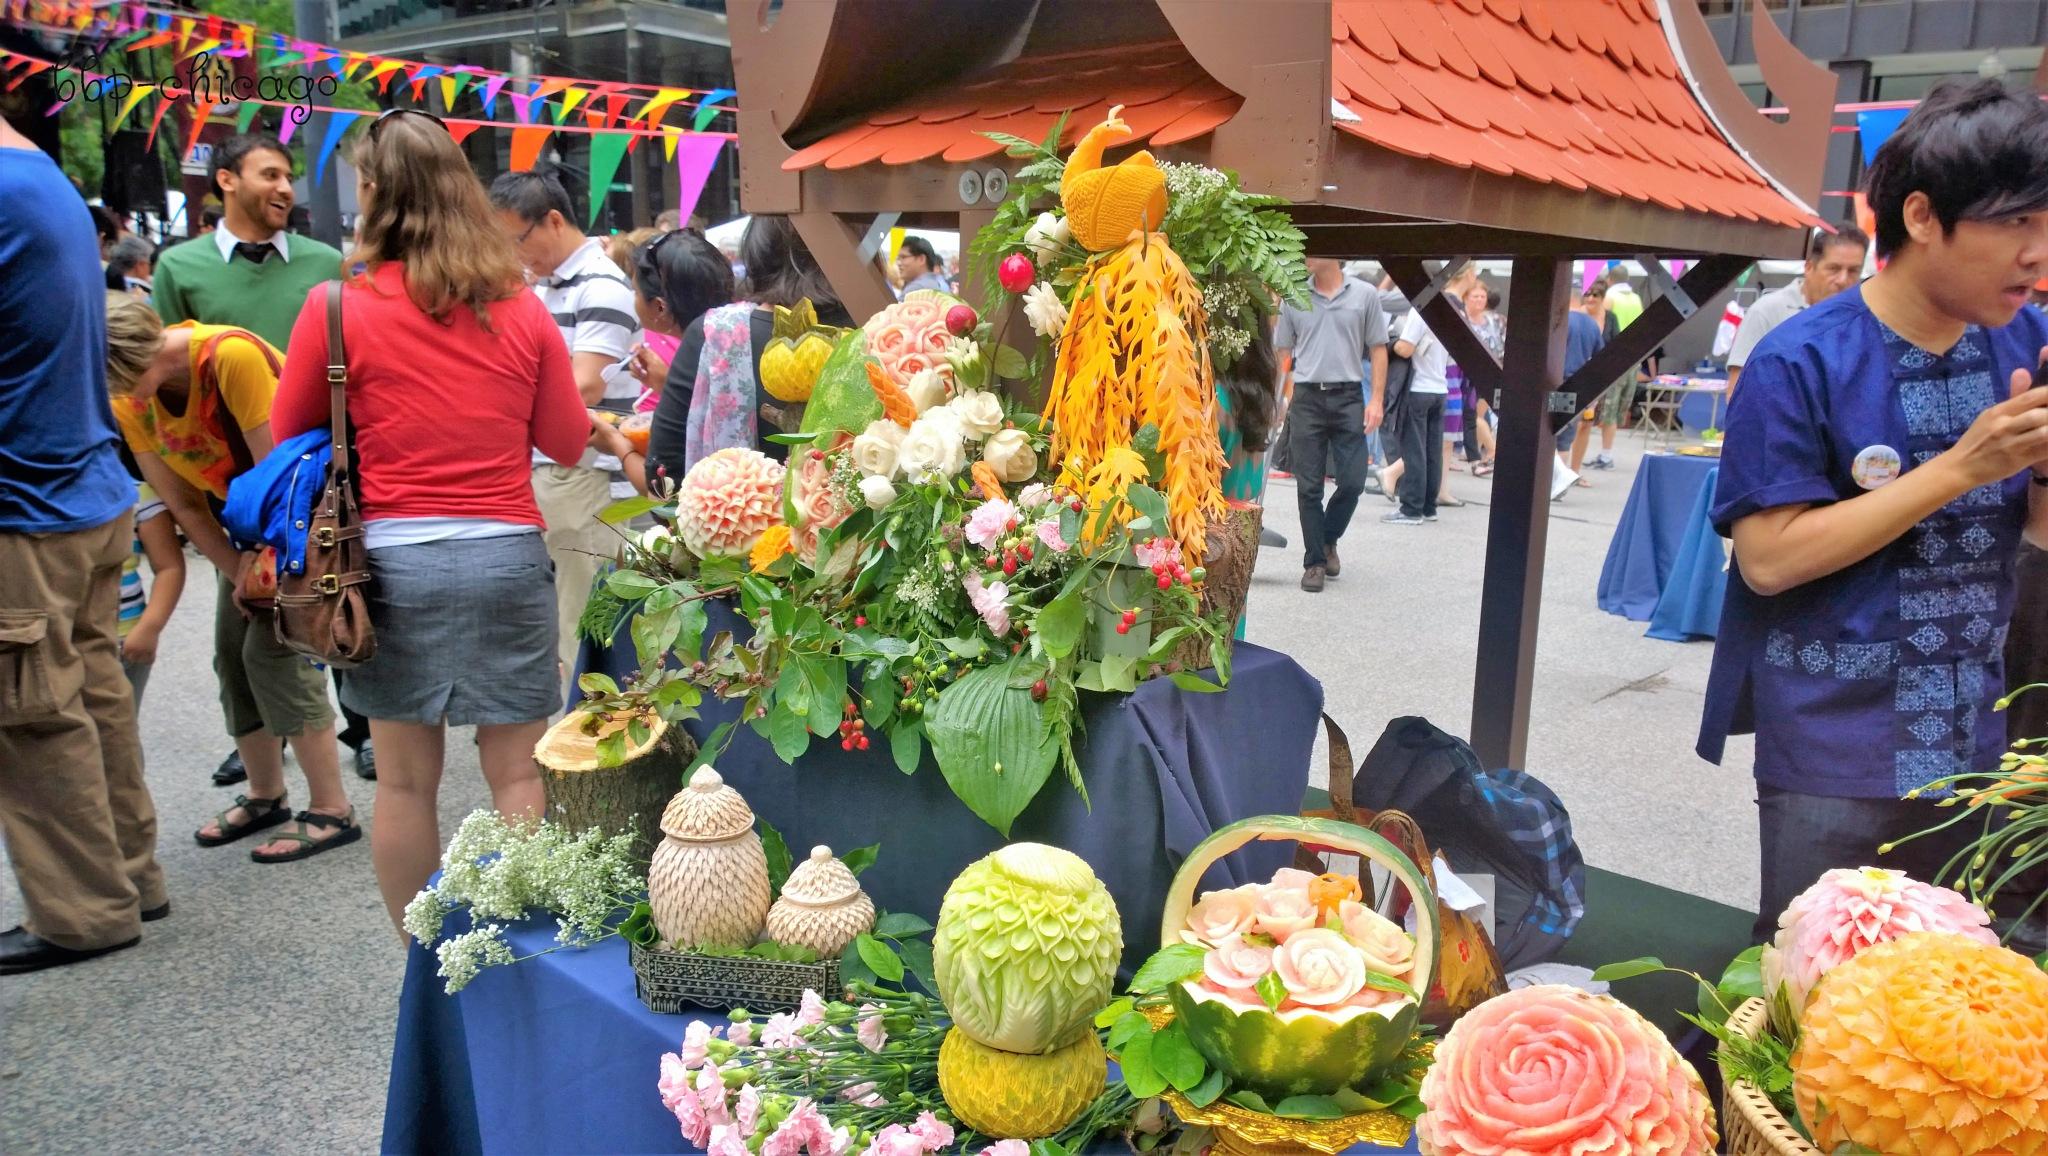 Street Vendor Artistry by Michele